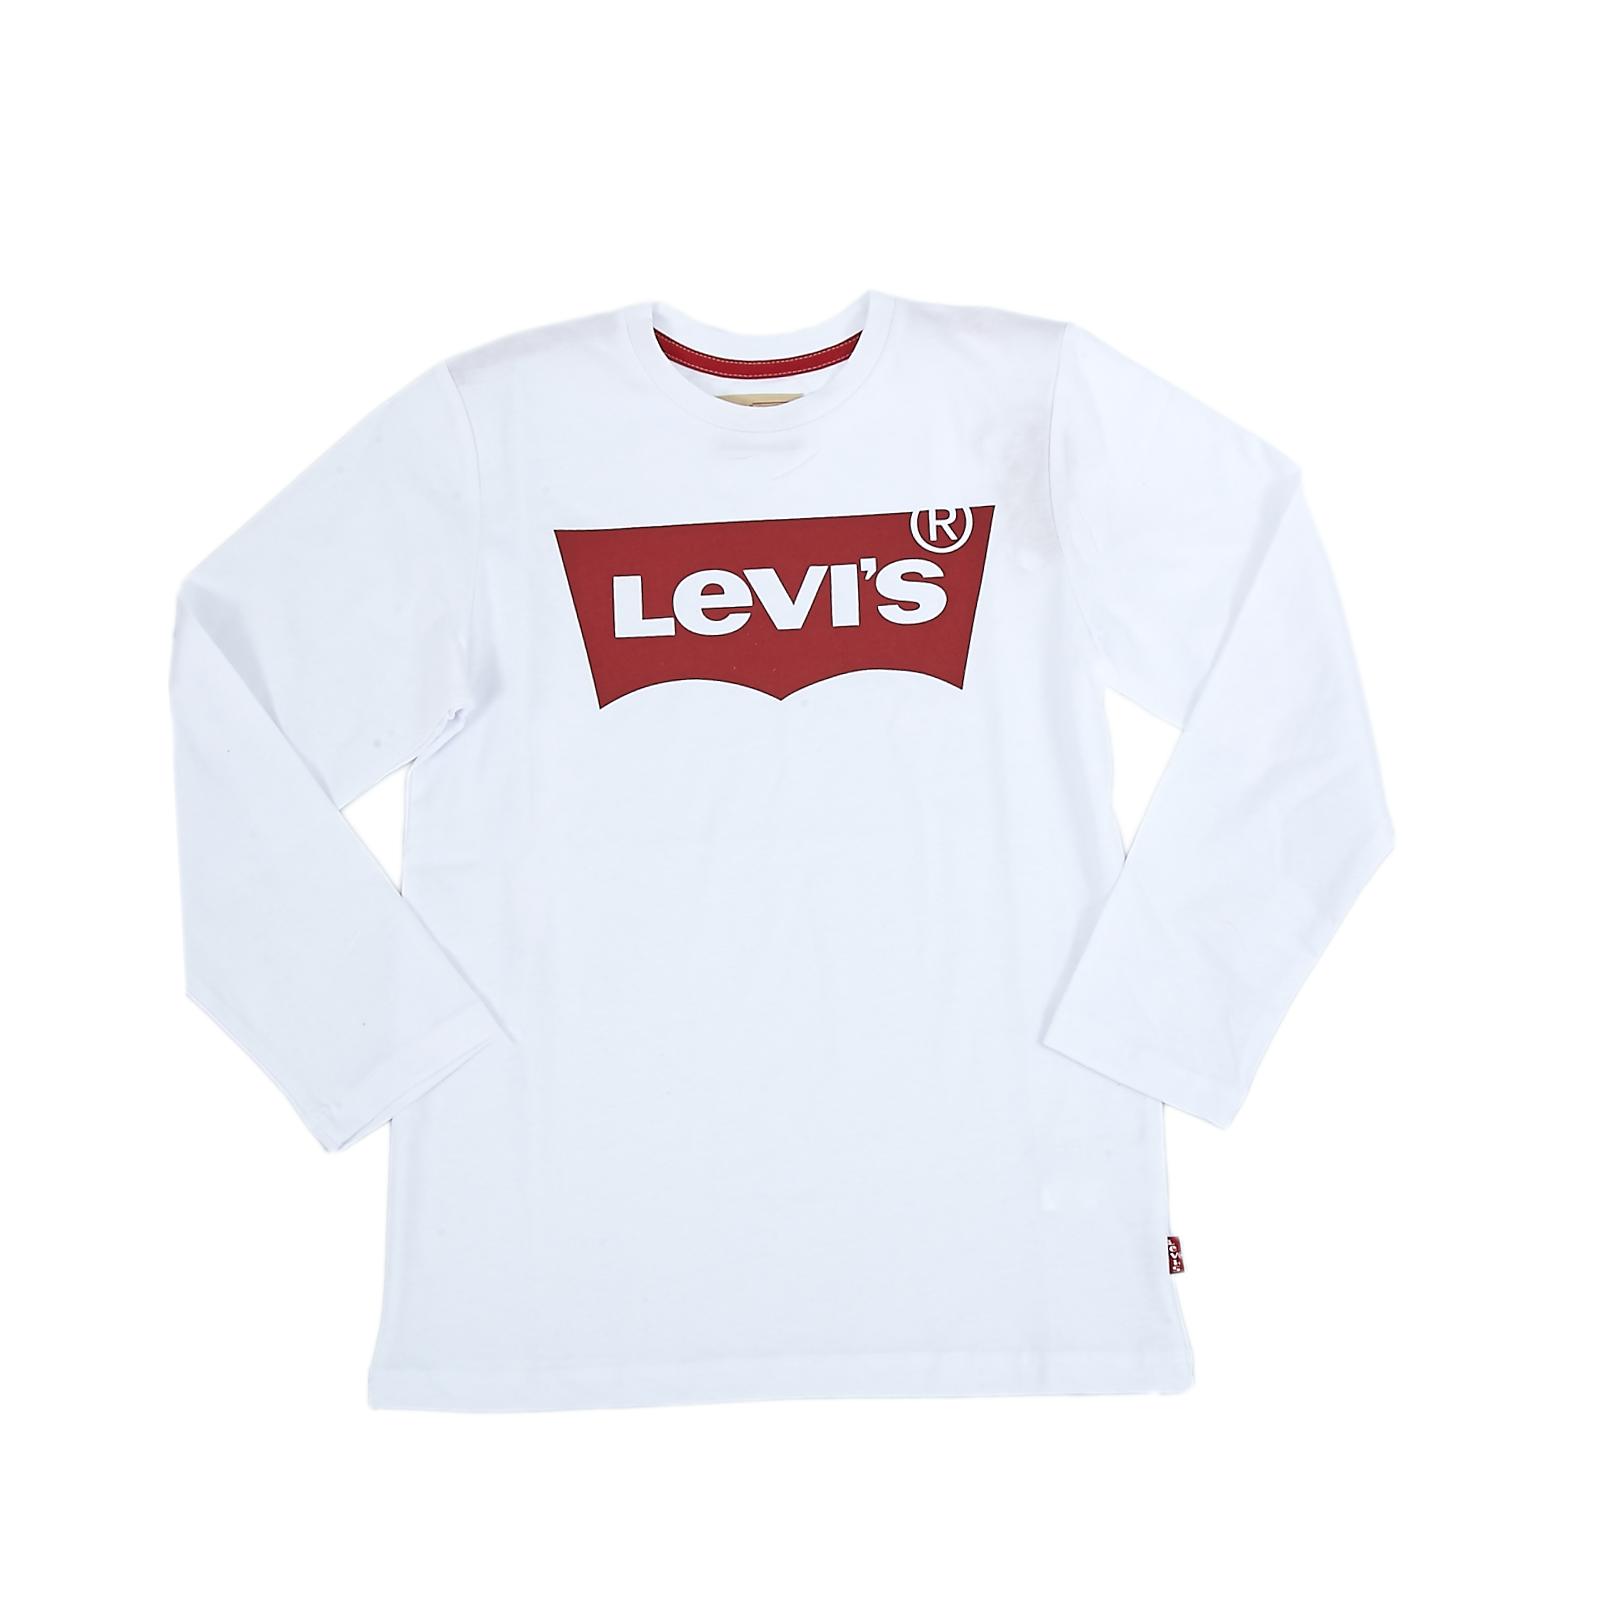 LEVI'S KIDS - Παιδική μπλούζα Levi's Kids λευκή